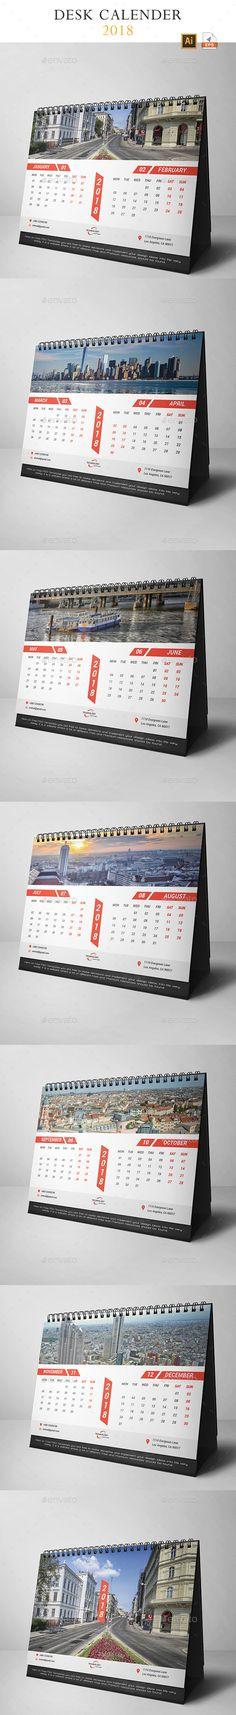 Desk Calendar 2018 Template Vector EPS, AI Illustrator